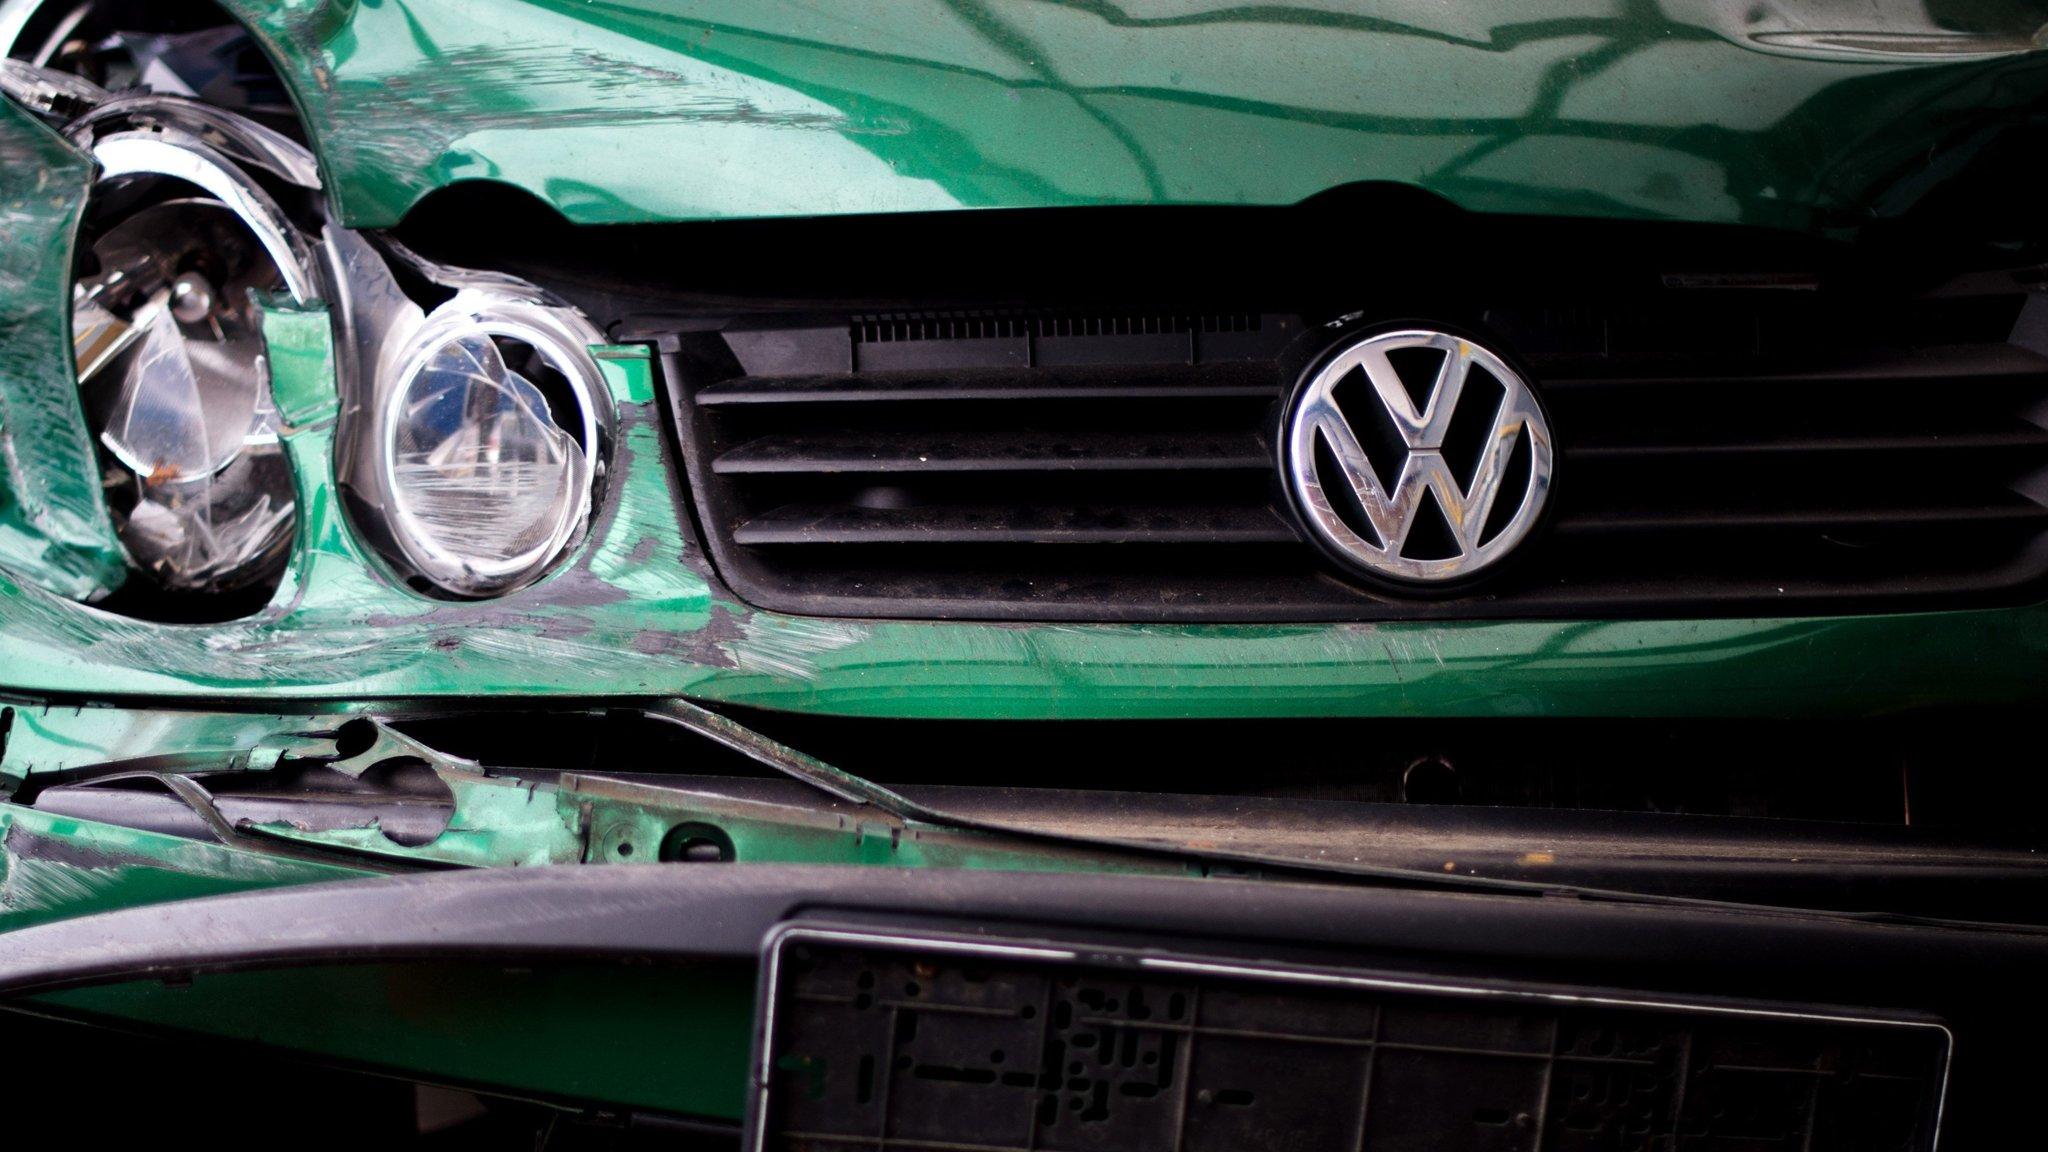 Wellington Car Wreckers Cash For Scrap Cars 4wds Trucks Auto Parts